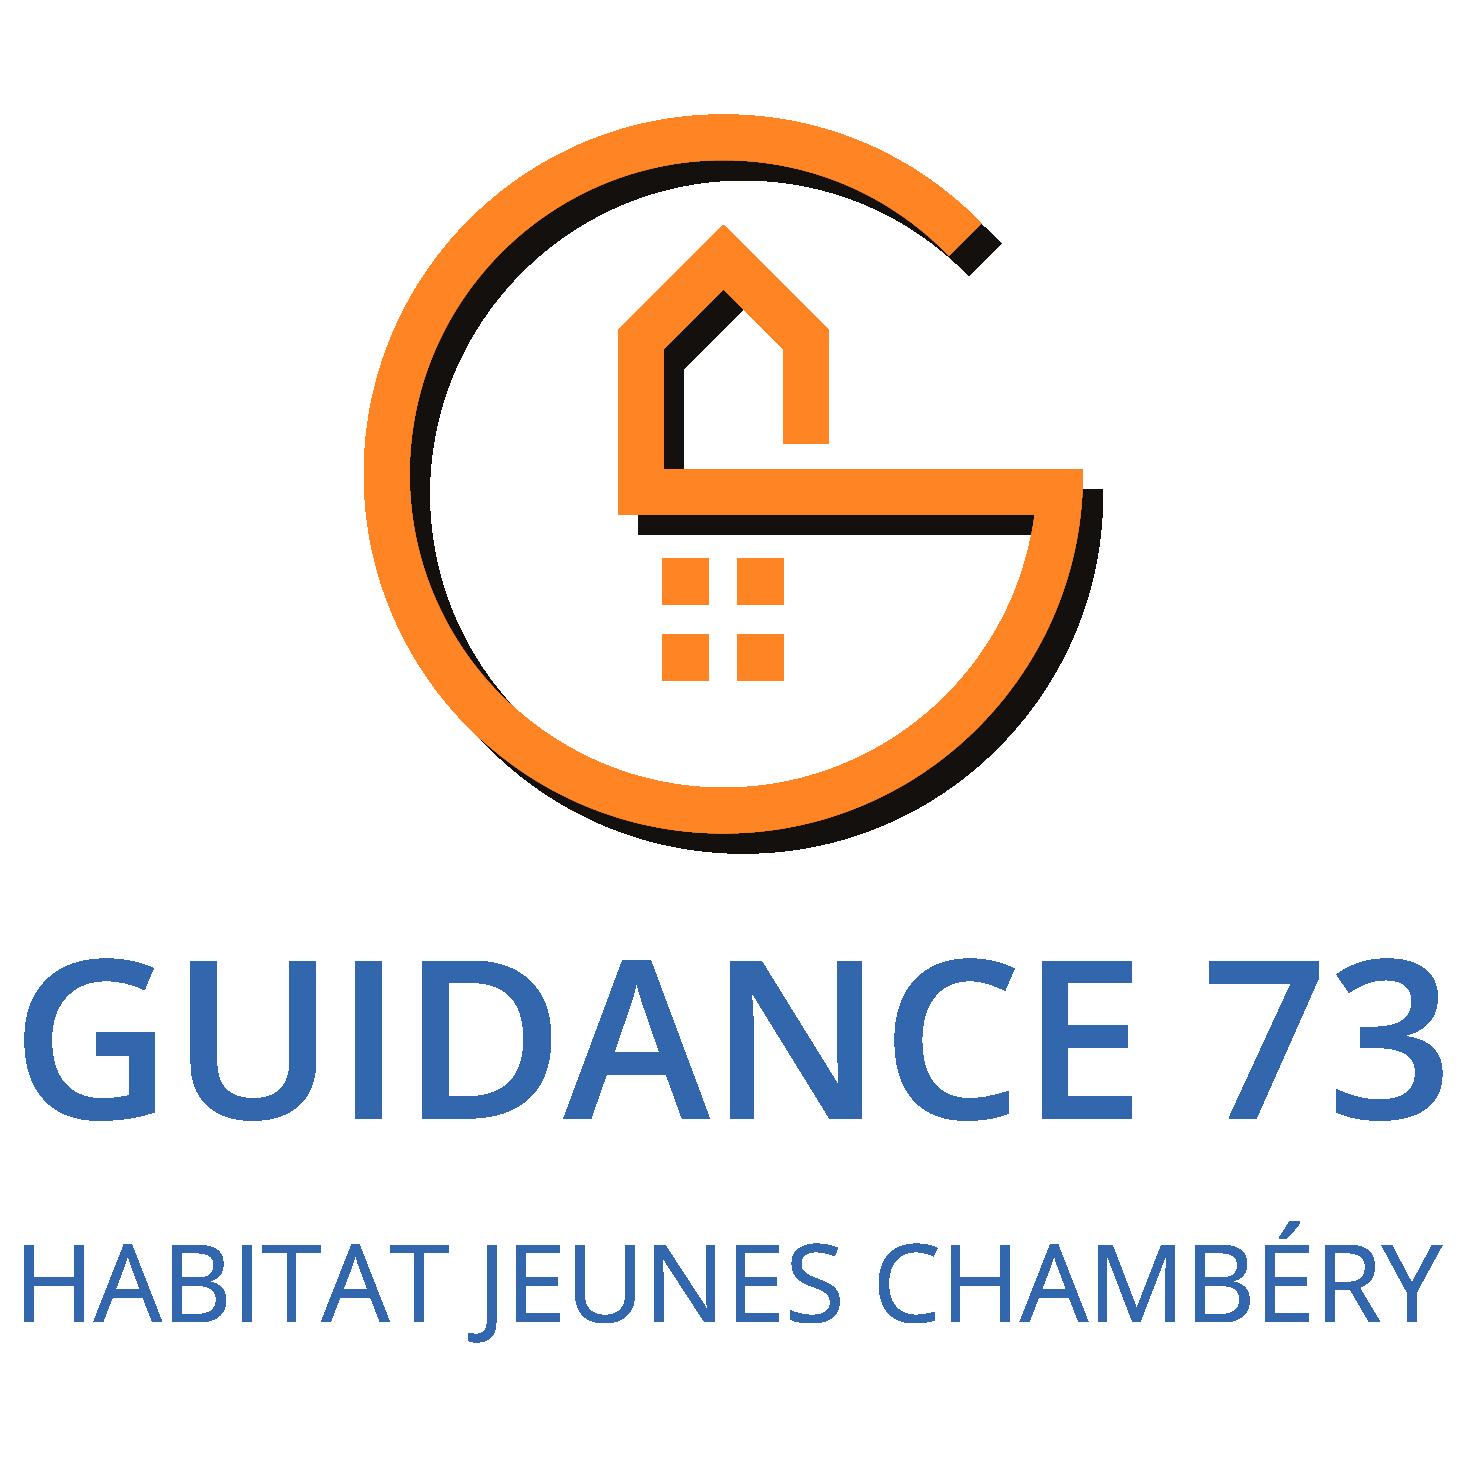 Guidance 73